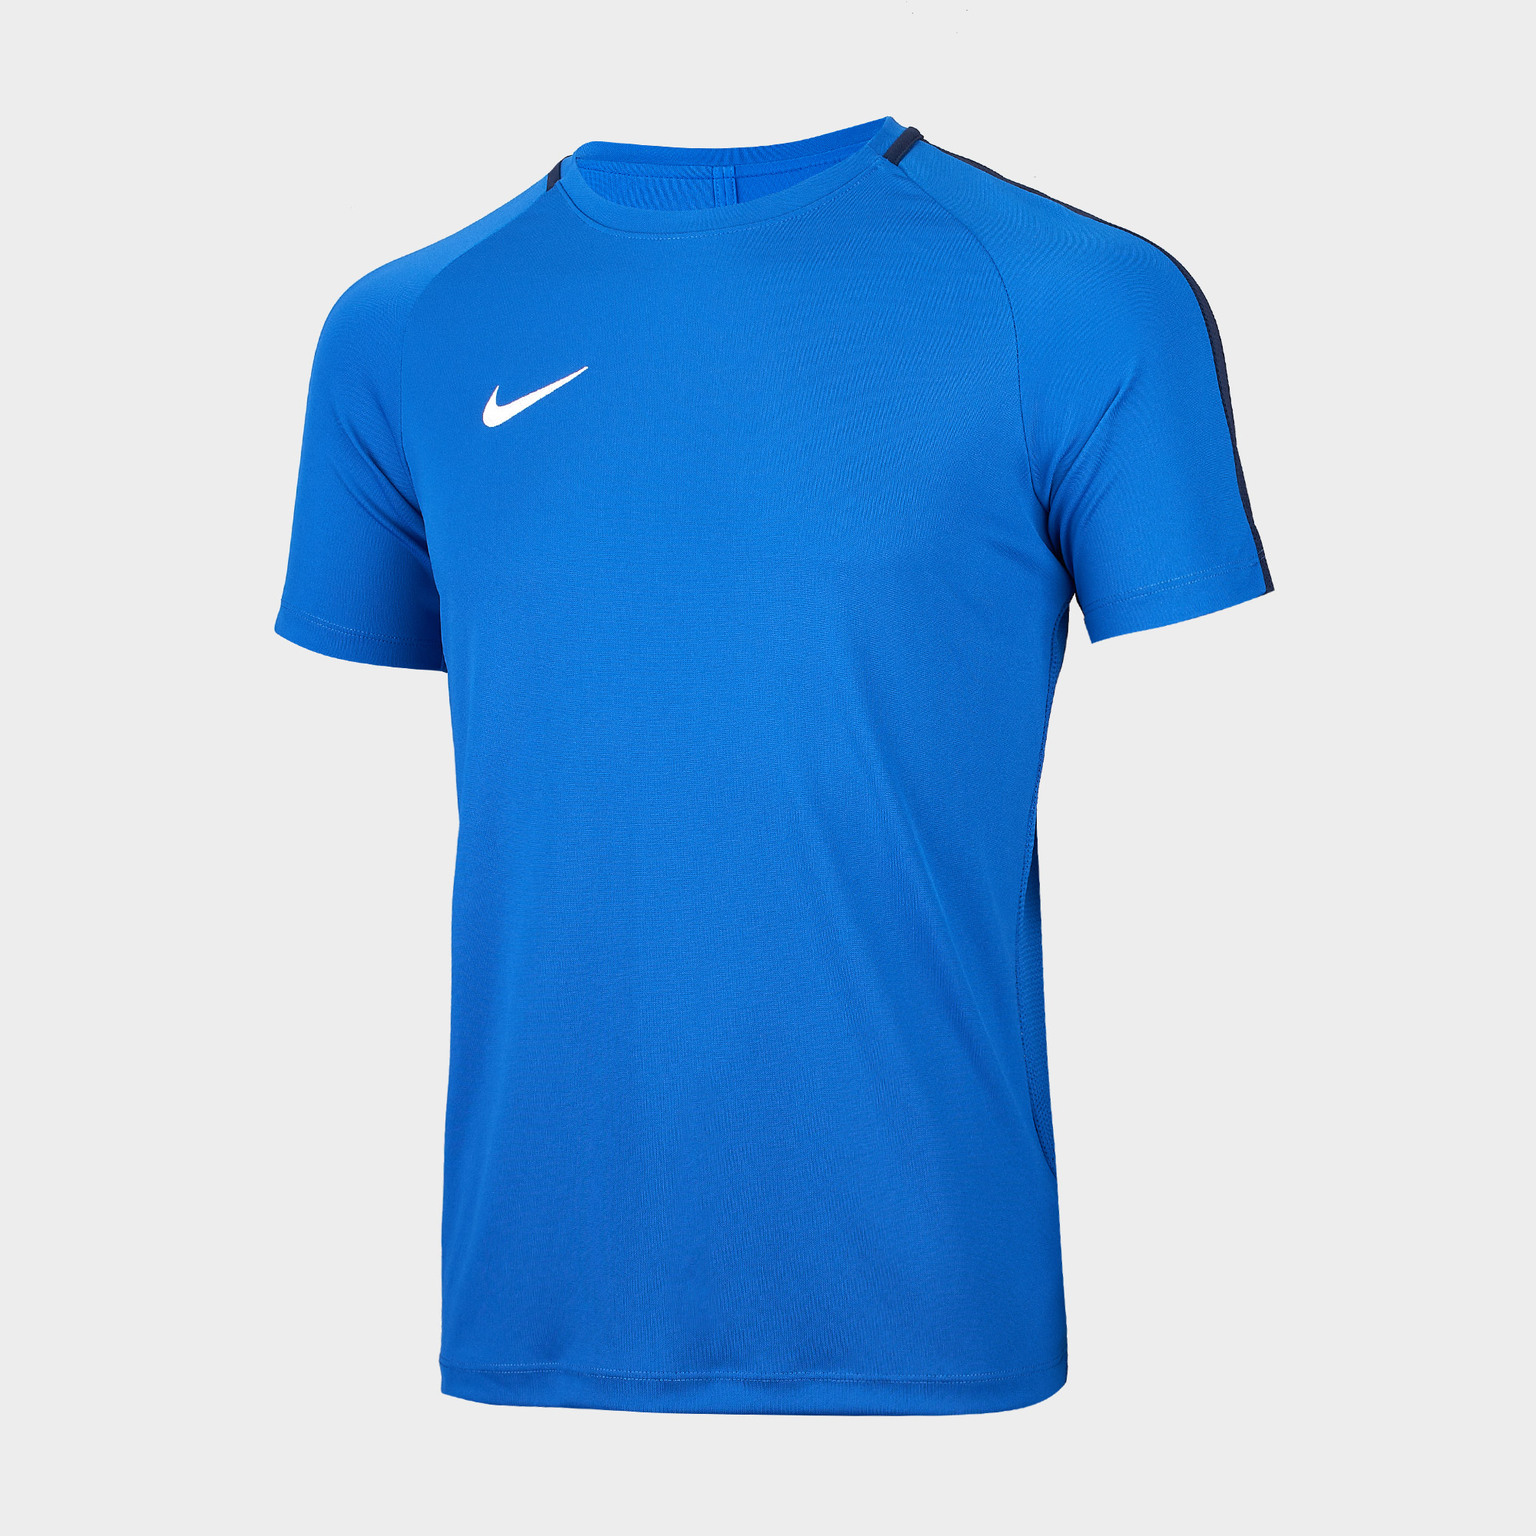 Футболка тренировочная Nike Academy18 Top JR 893750-463 детские бутсы nike бутсы nike jr phantom 3 elite df fg ah7292 081